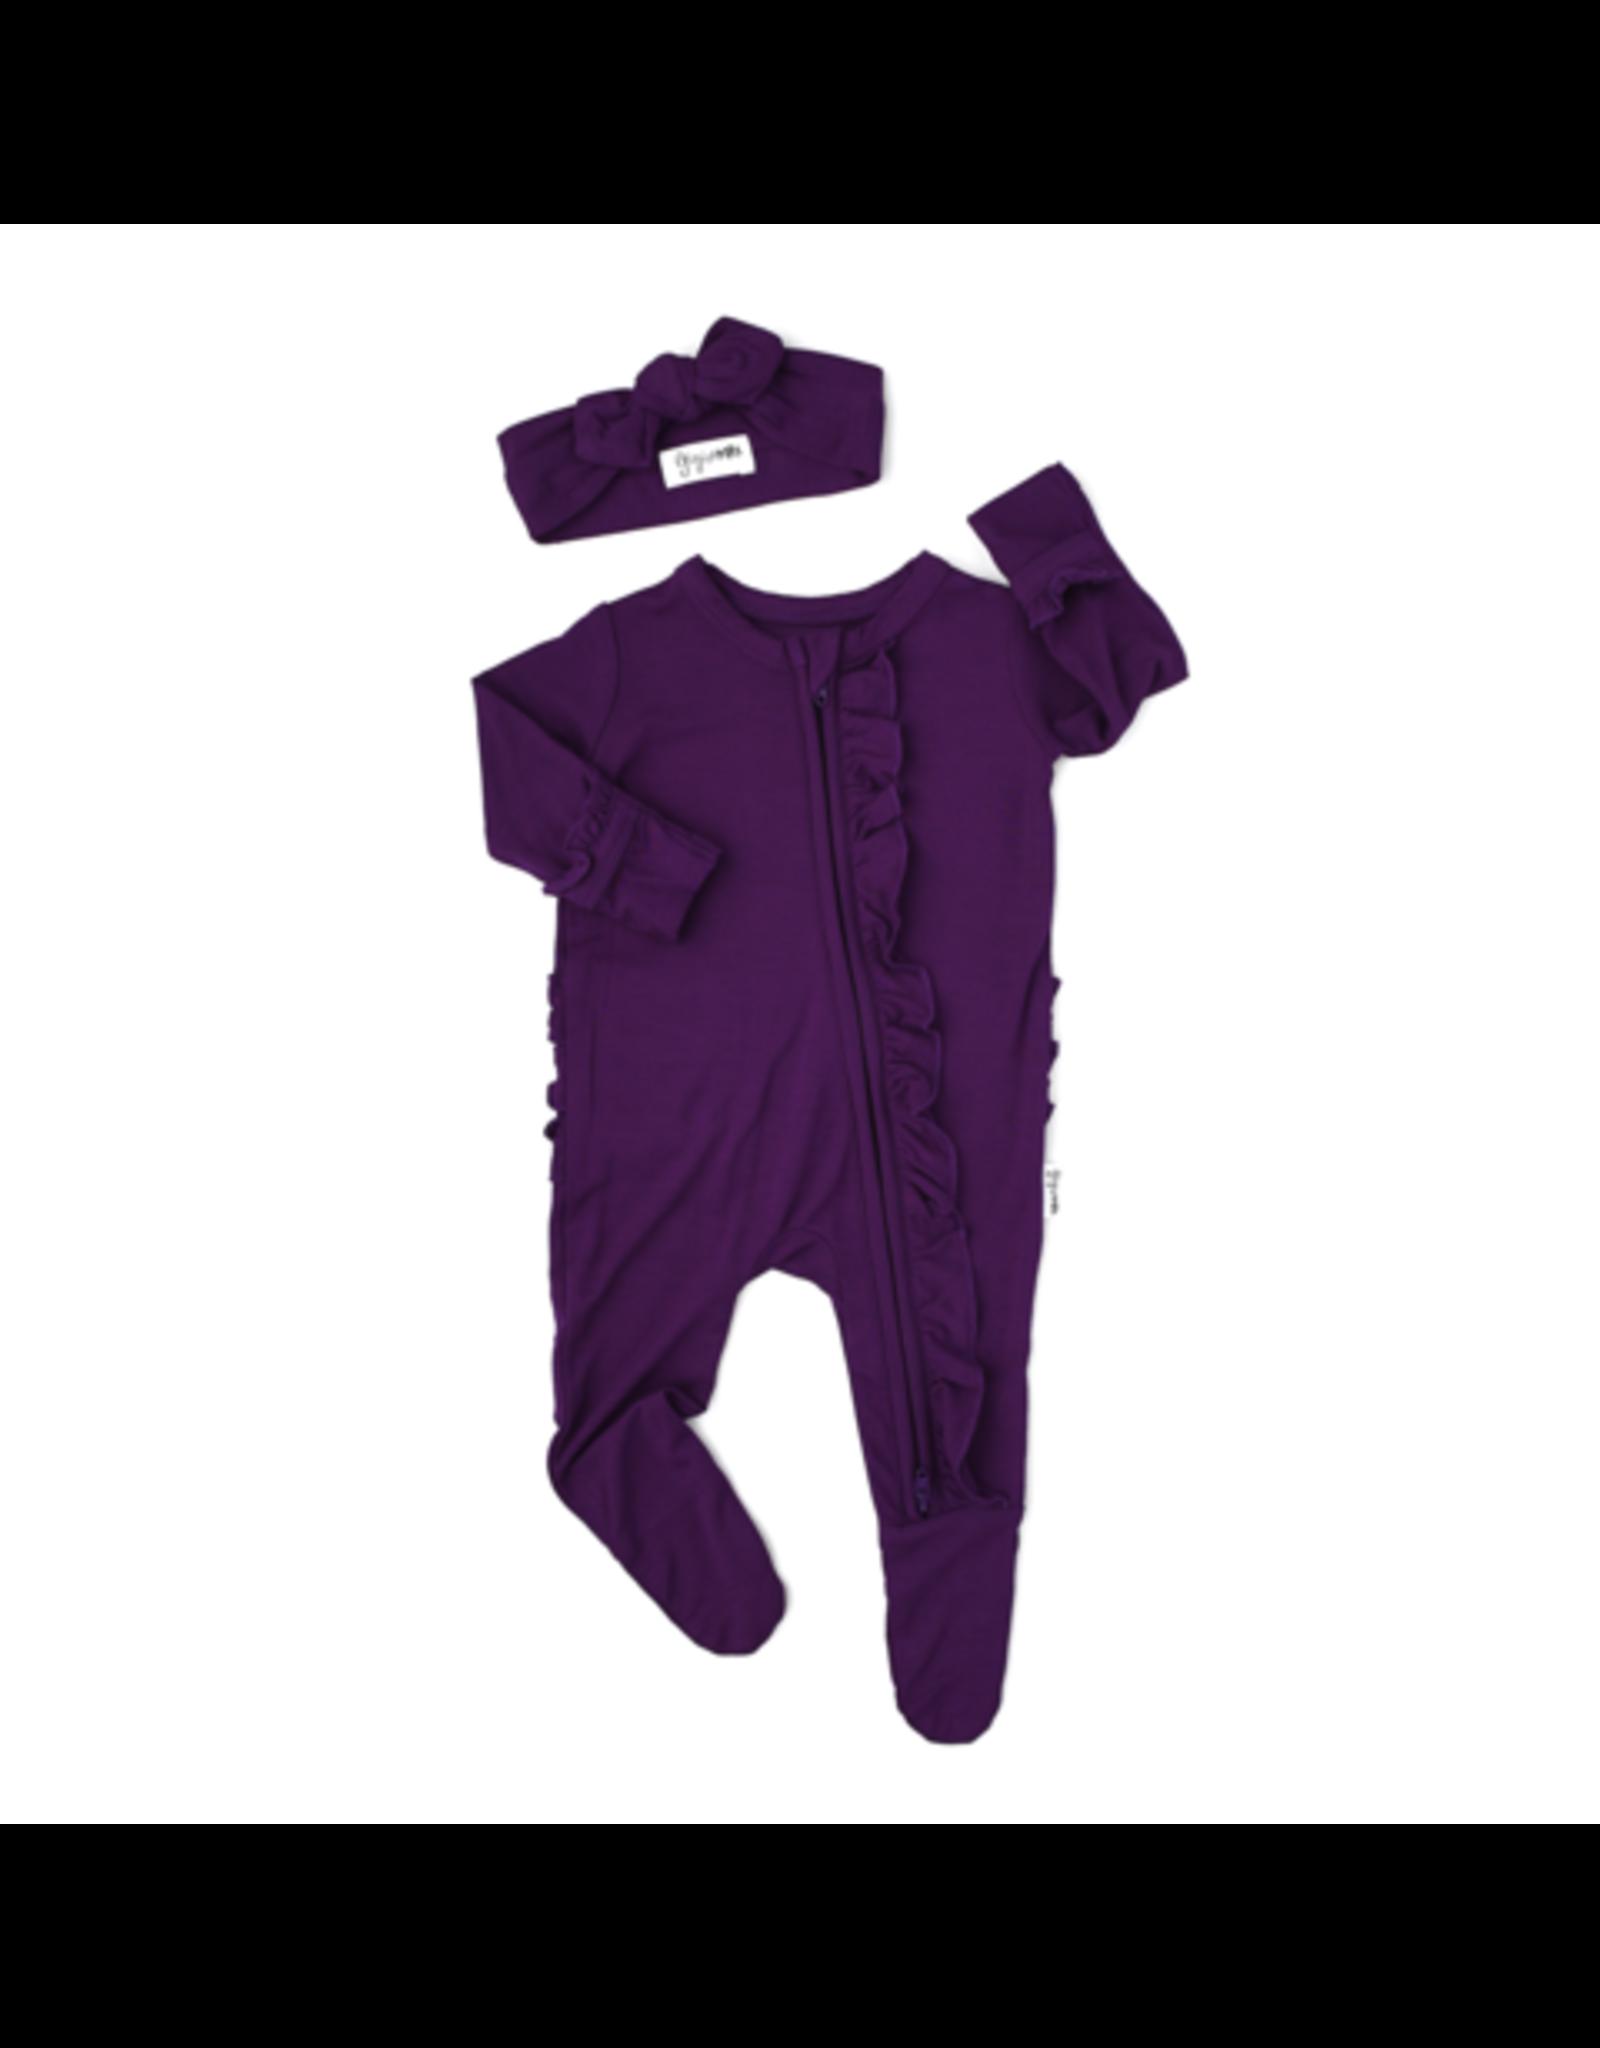 Gigi & Max Gigi & Max- Audrey Plum Newborn Ruffle Zipper Footie & Headband Set